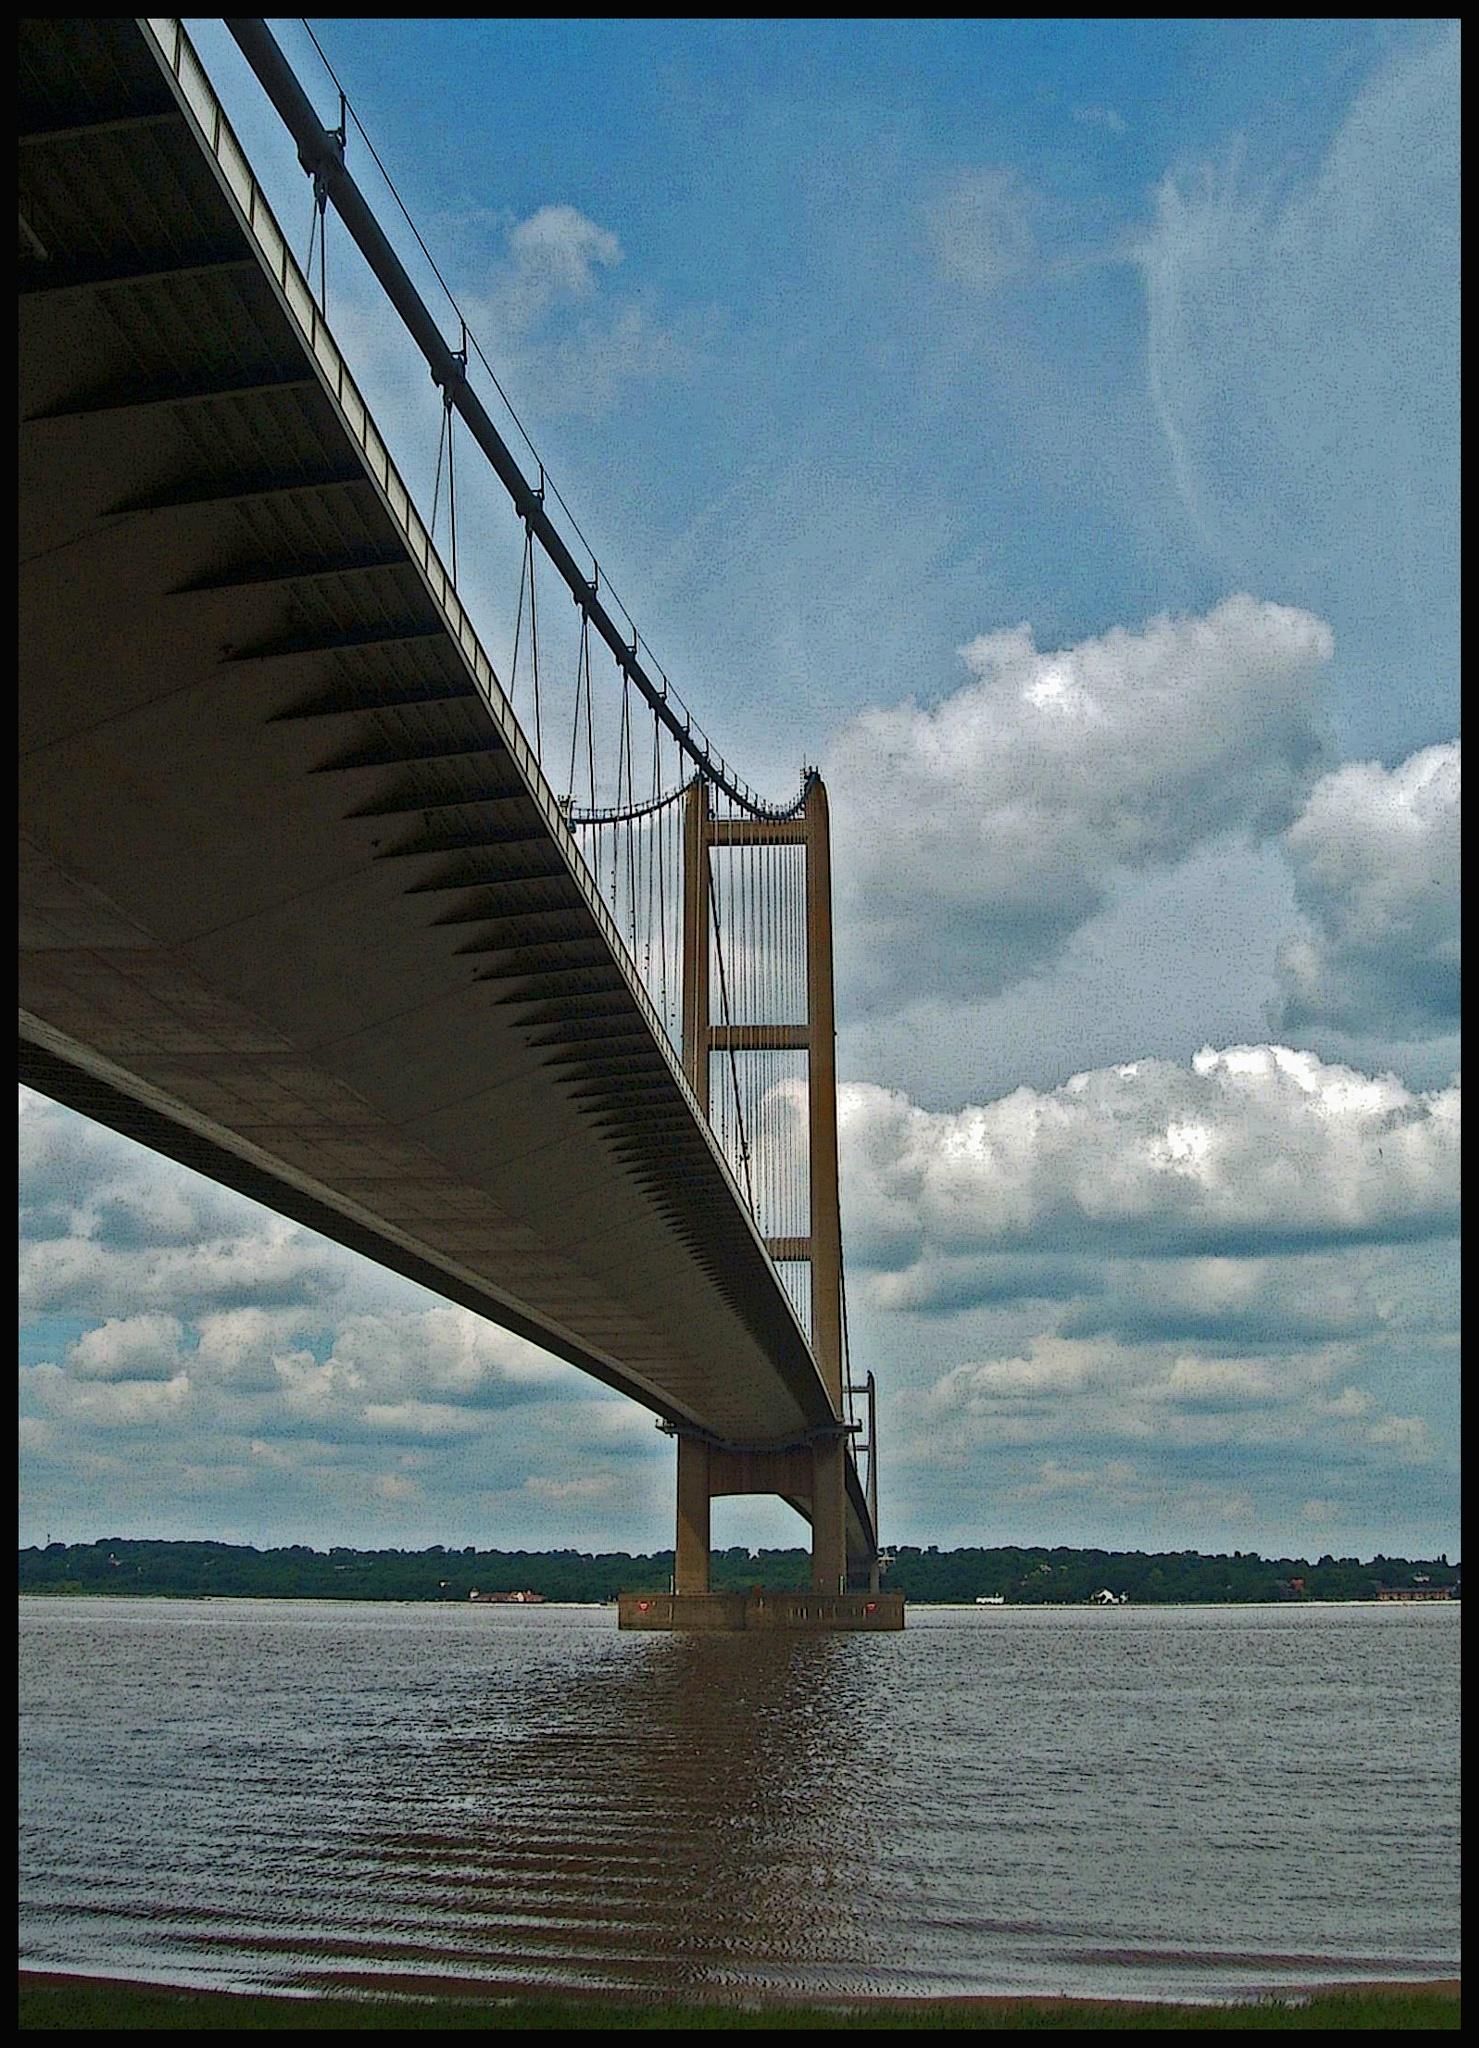 Humber Bridge by Terry Jackson